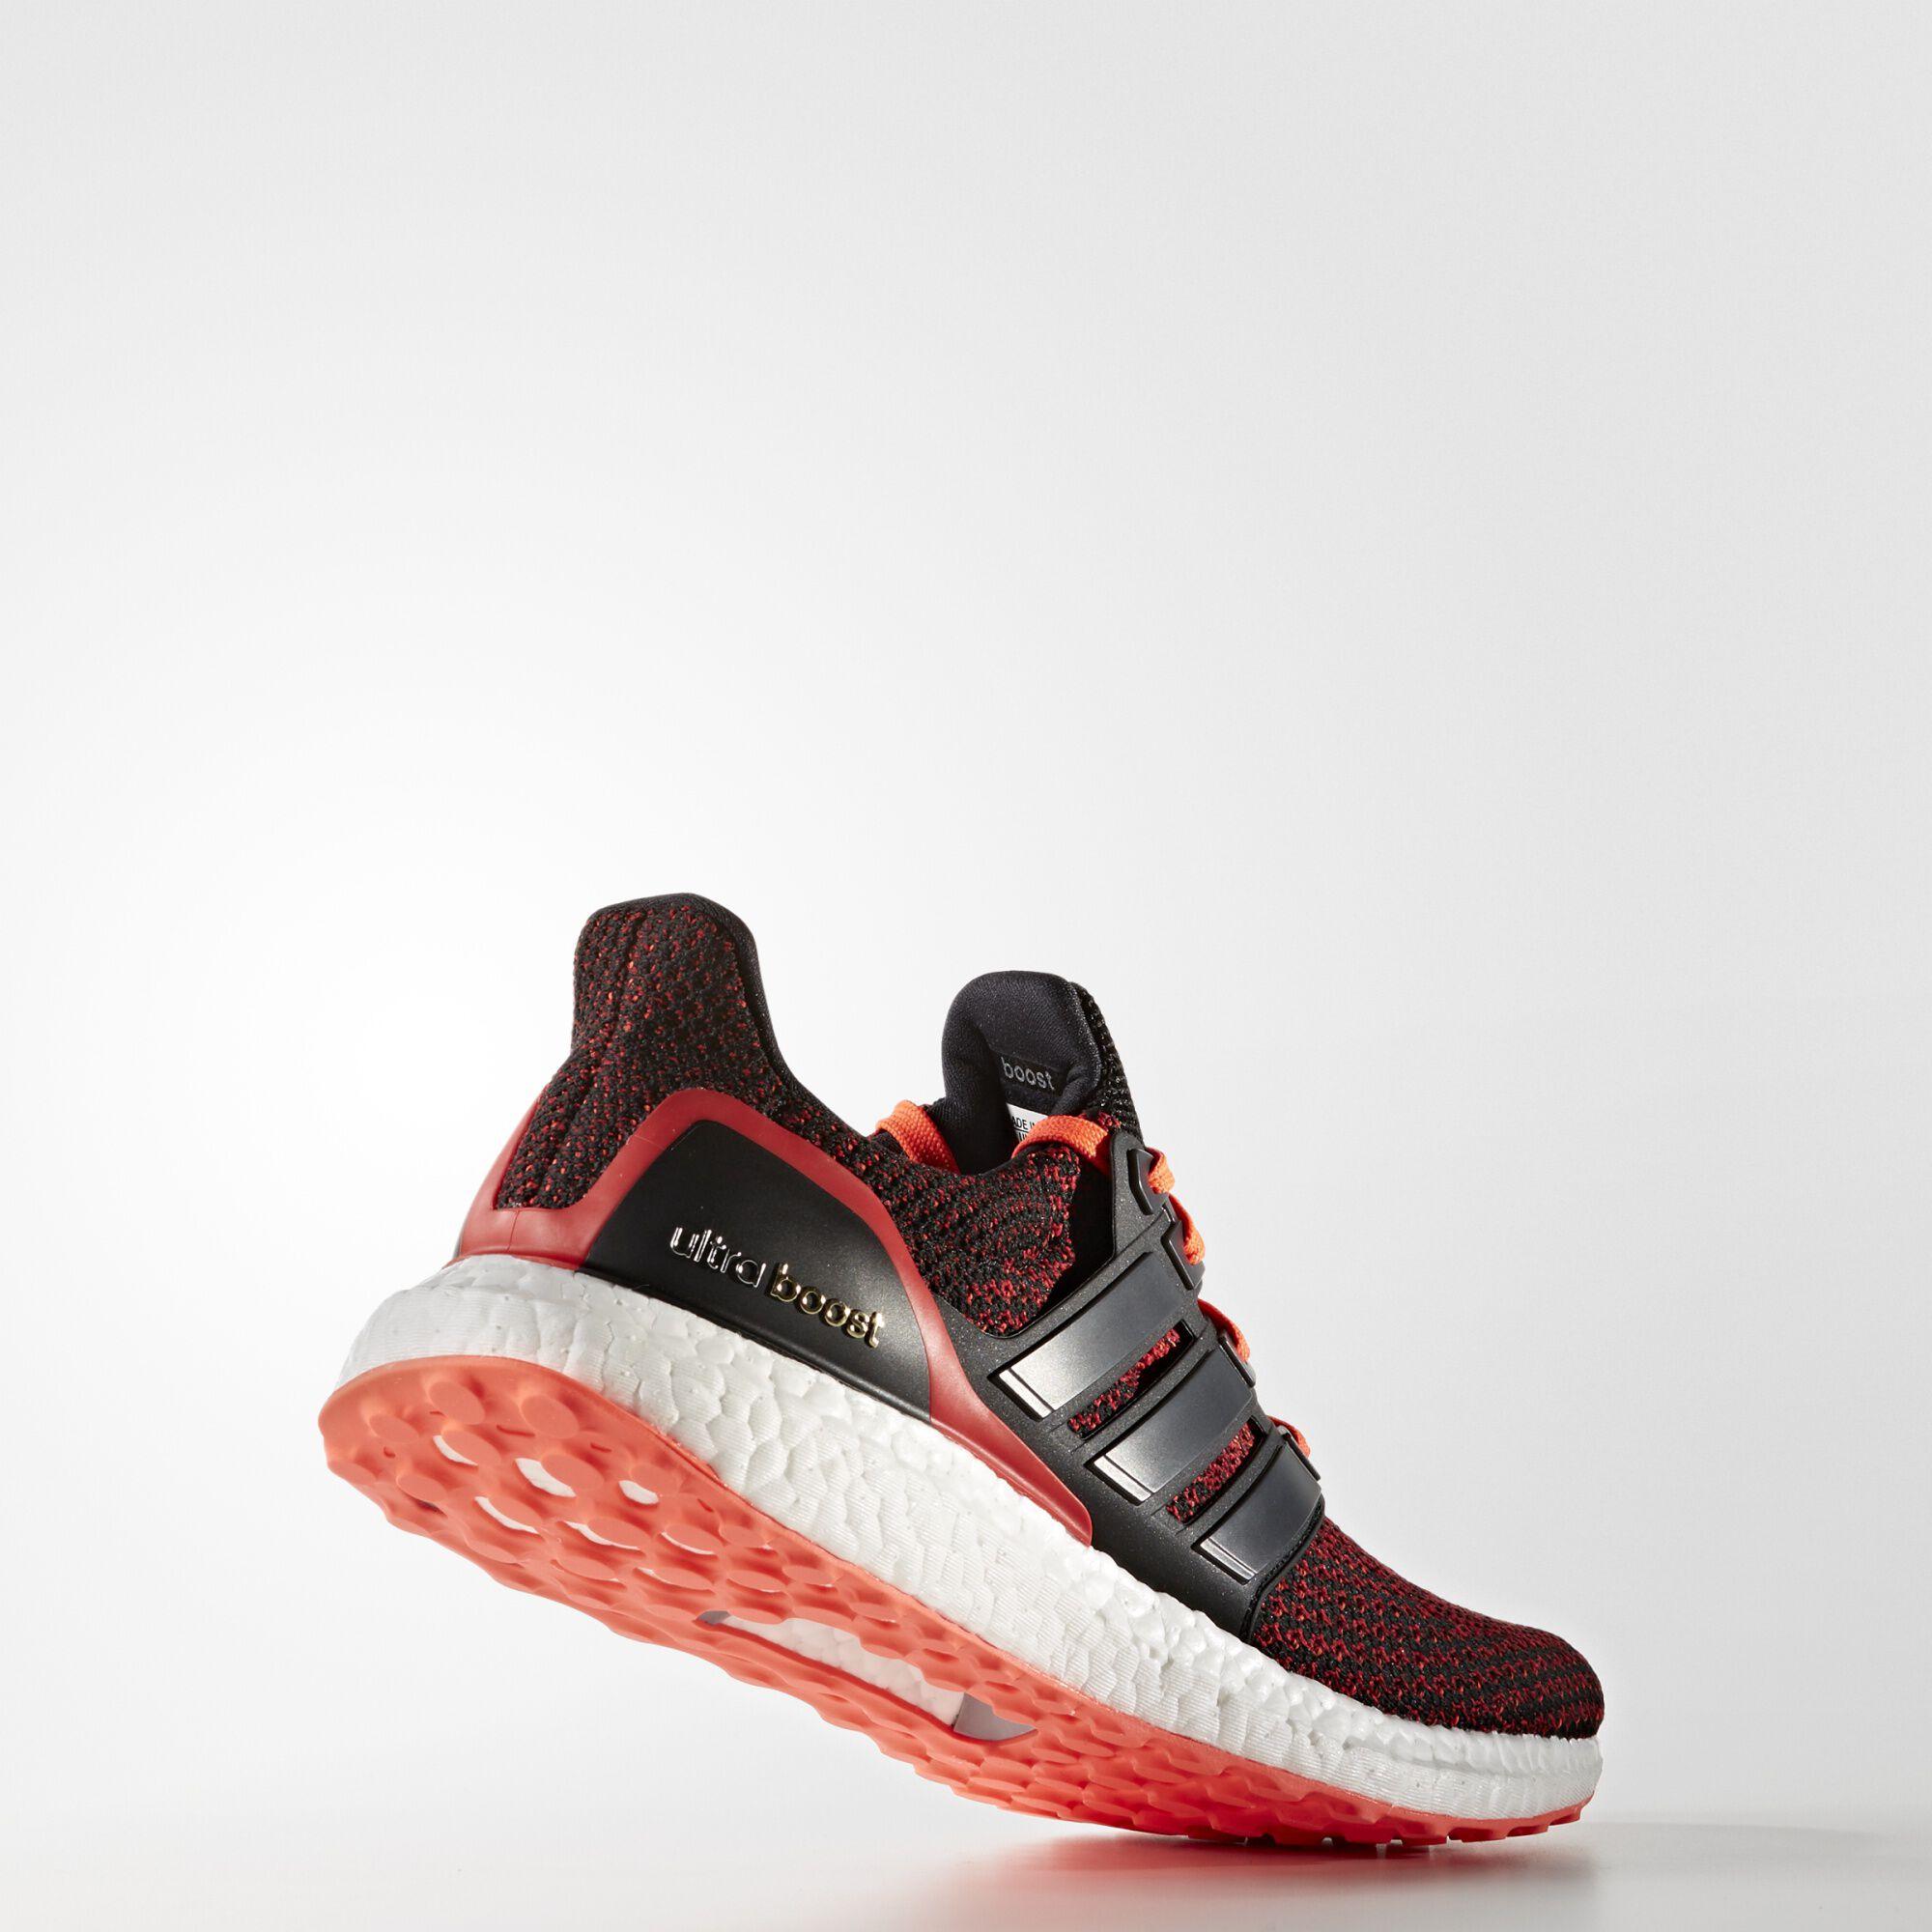 0d8ffb495 adidas  Ultra Boost  Solar Red  CW  Core Black Core Black Solar Red SKU   AQ5930 Release  05.16.16. Retail   180